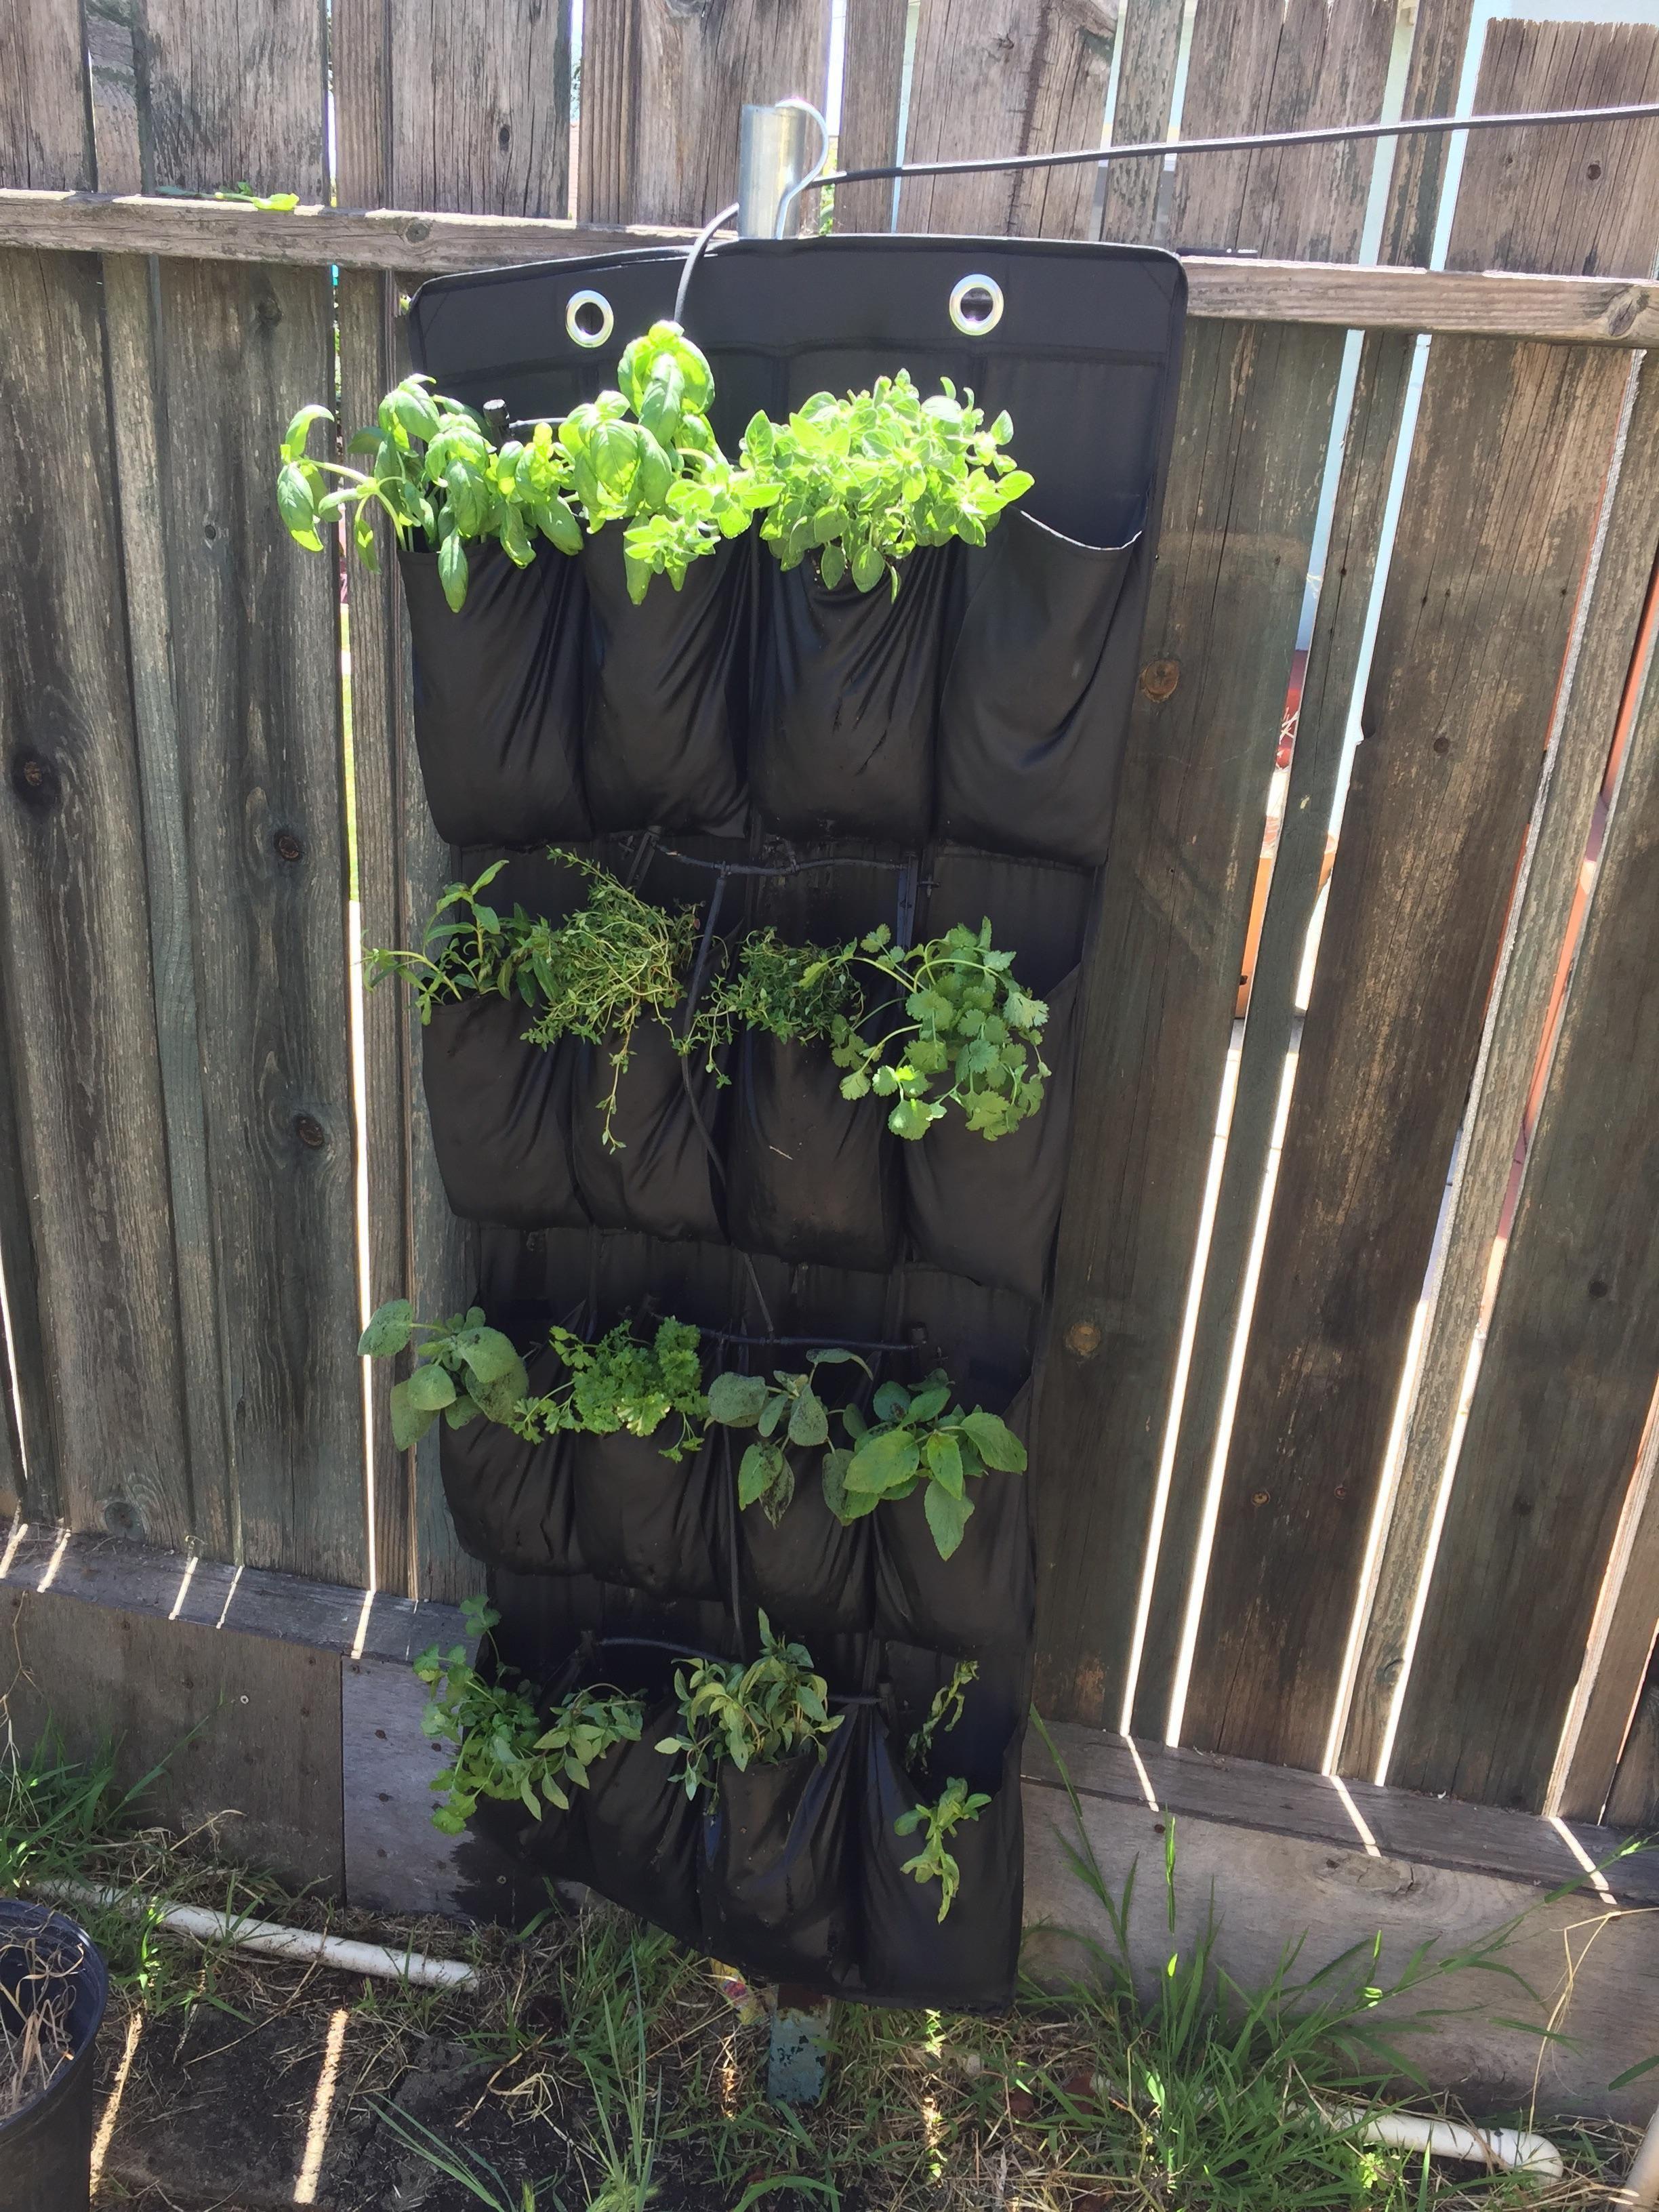 $4 IKEA shoe rack makes an excellent vertical planter #gardening